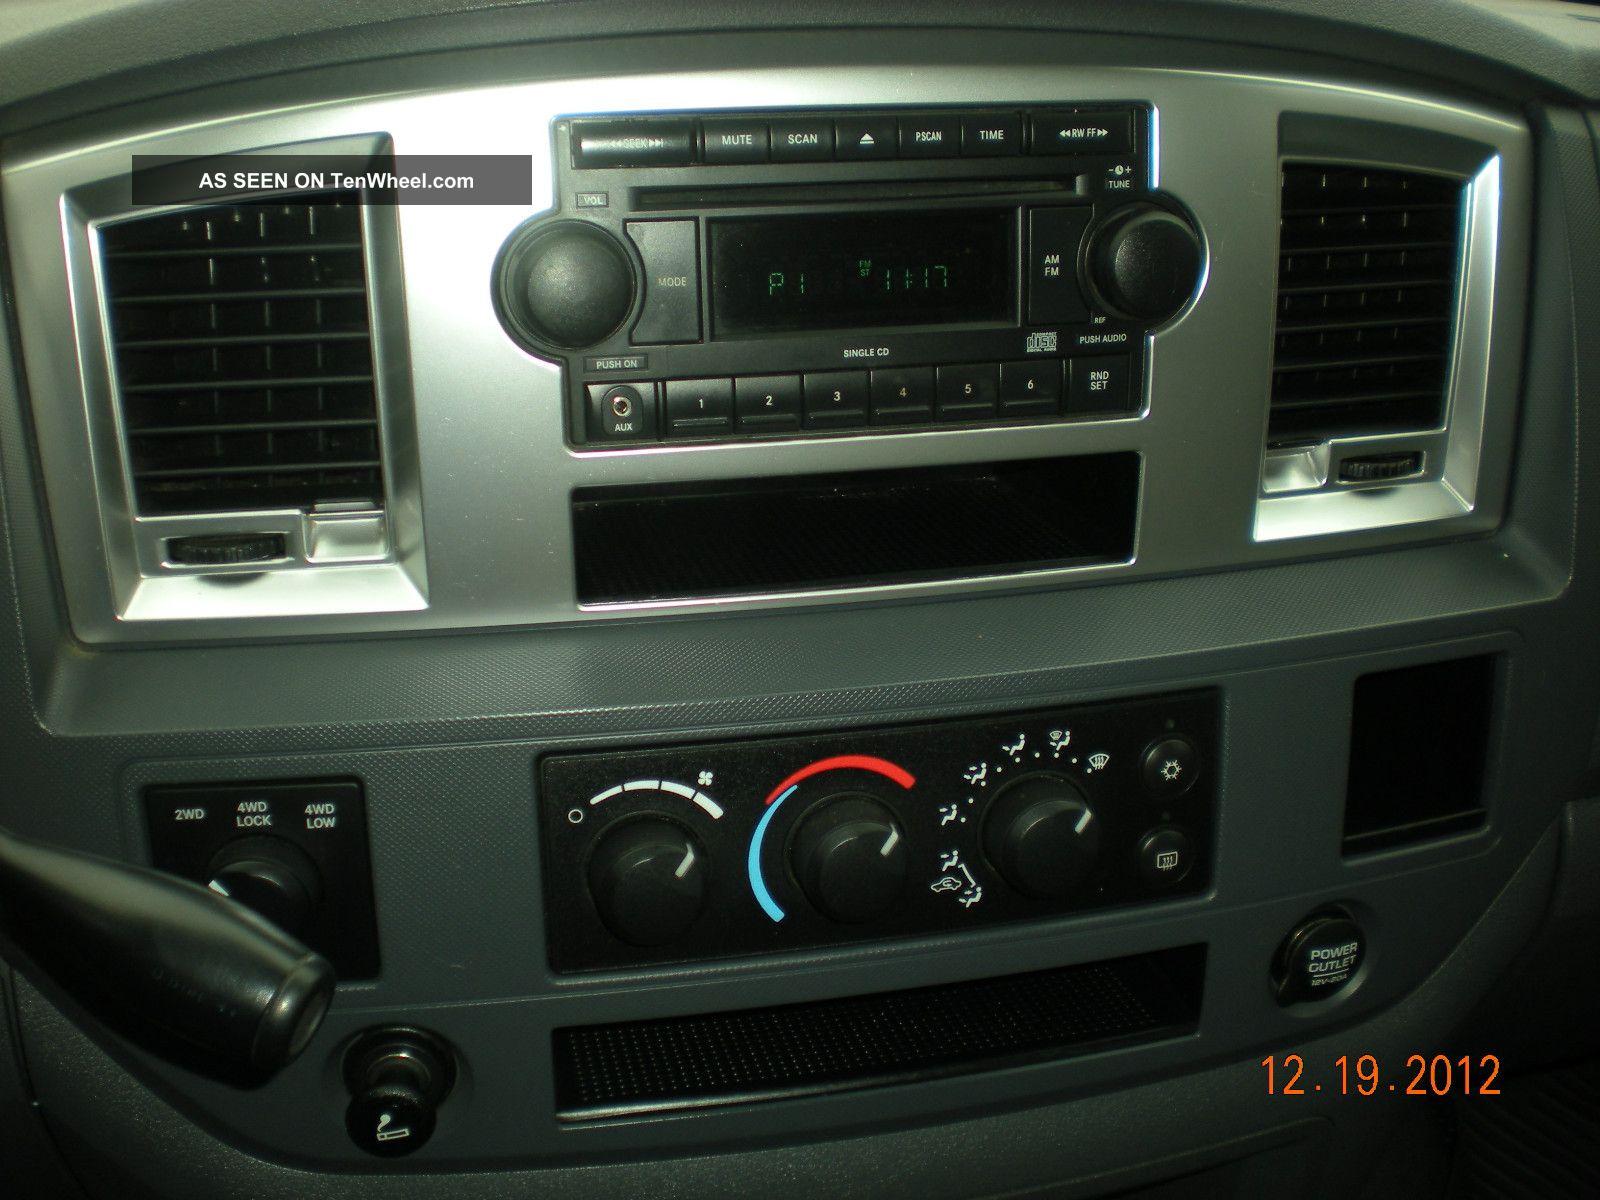 2007 Dodge Ram 2500 Mega Cab 5 9 Cummins Diesel Lifted Custom 4x4 20 S